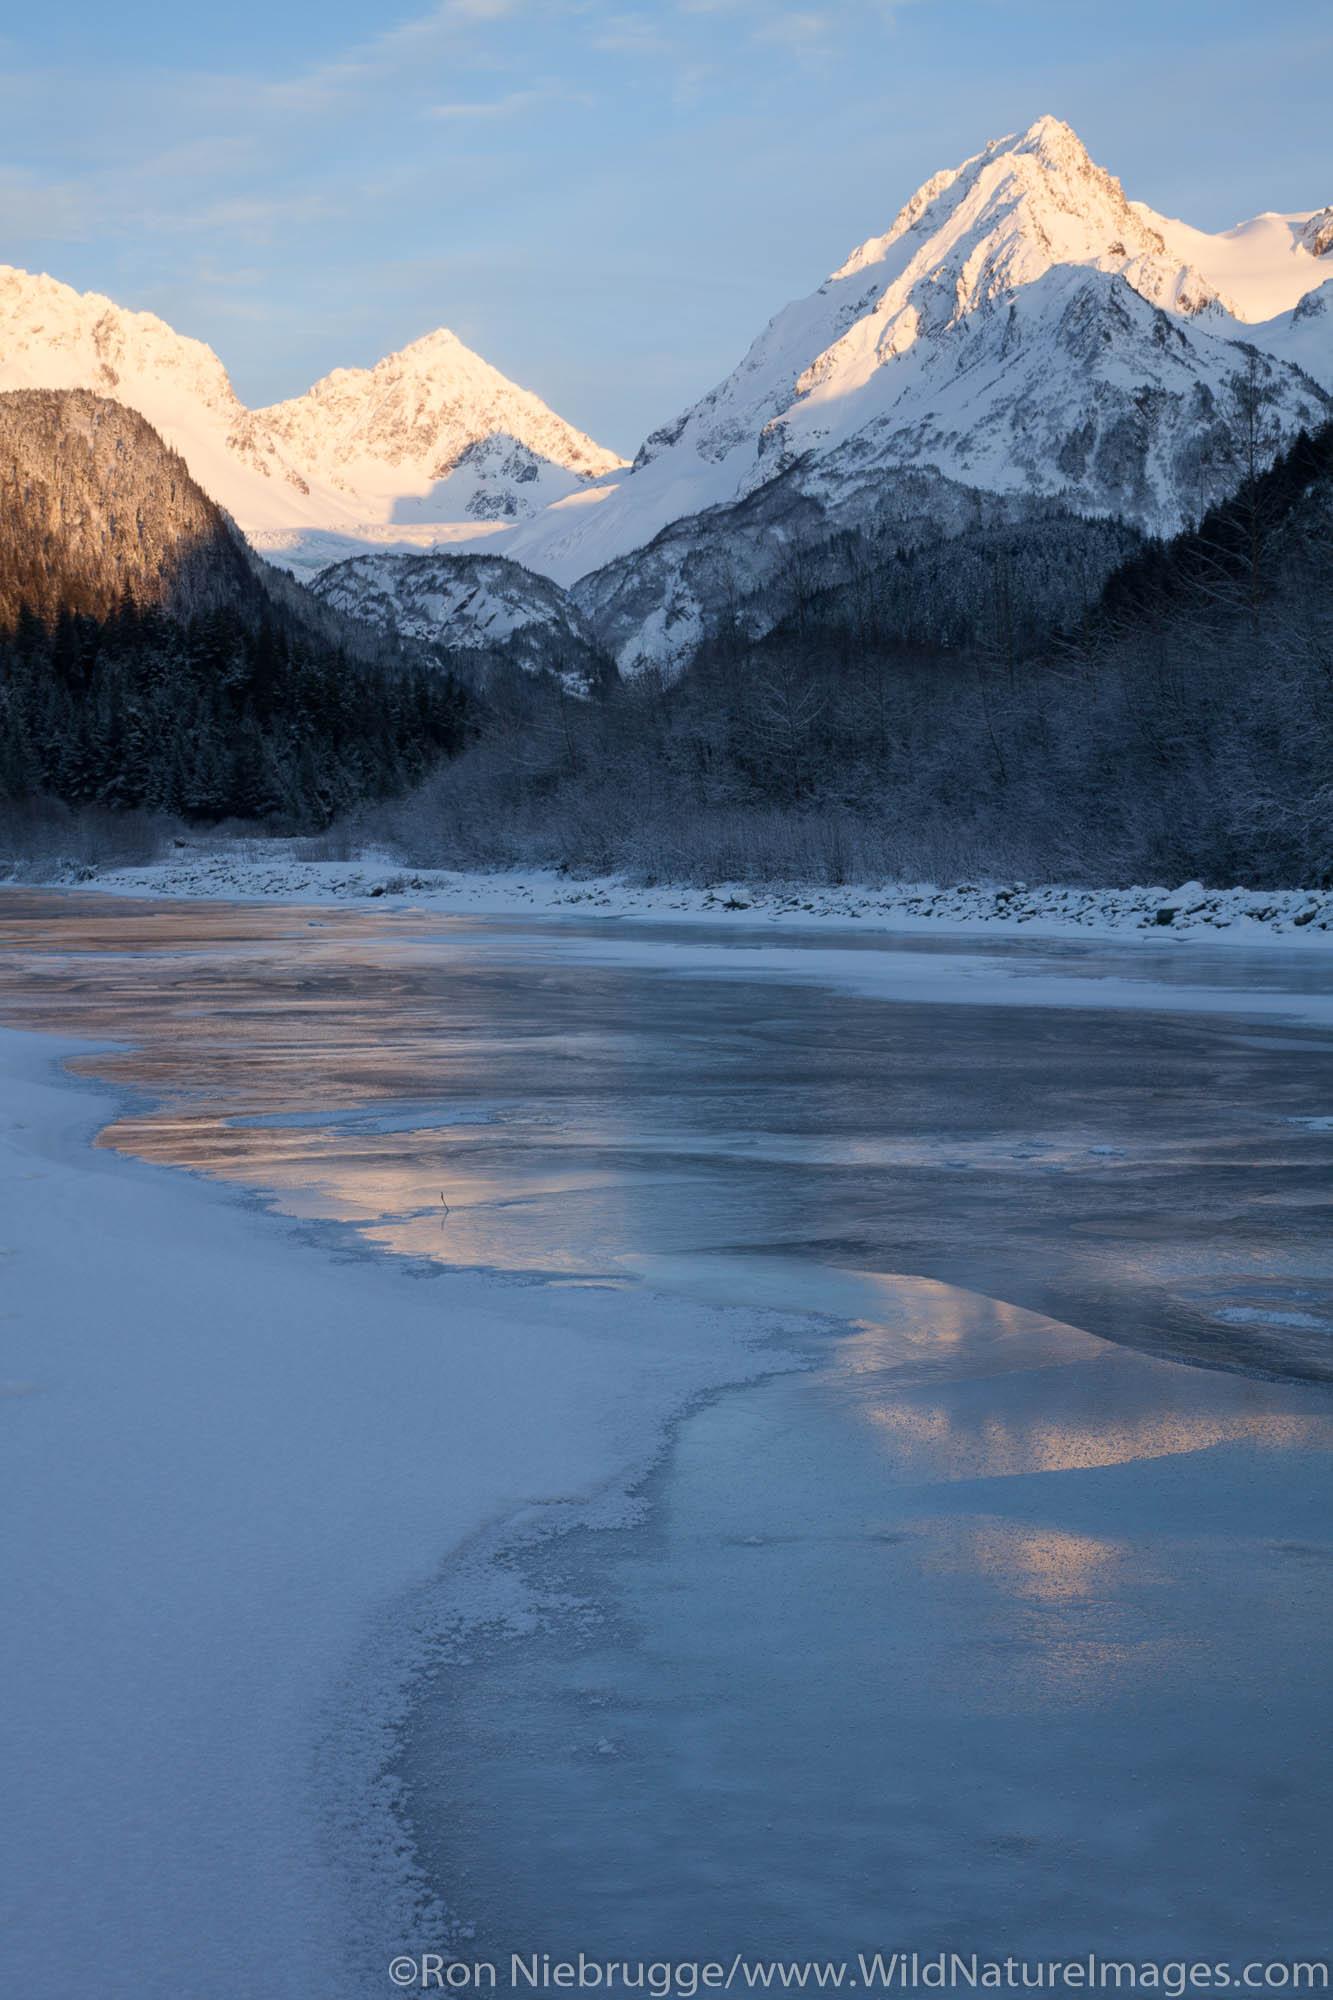 Winter in the Chugach National Forest, along Fourth of July Creek, Seward, Alaska.